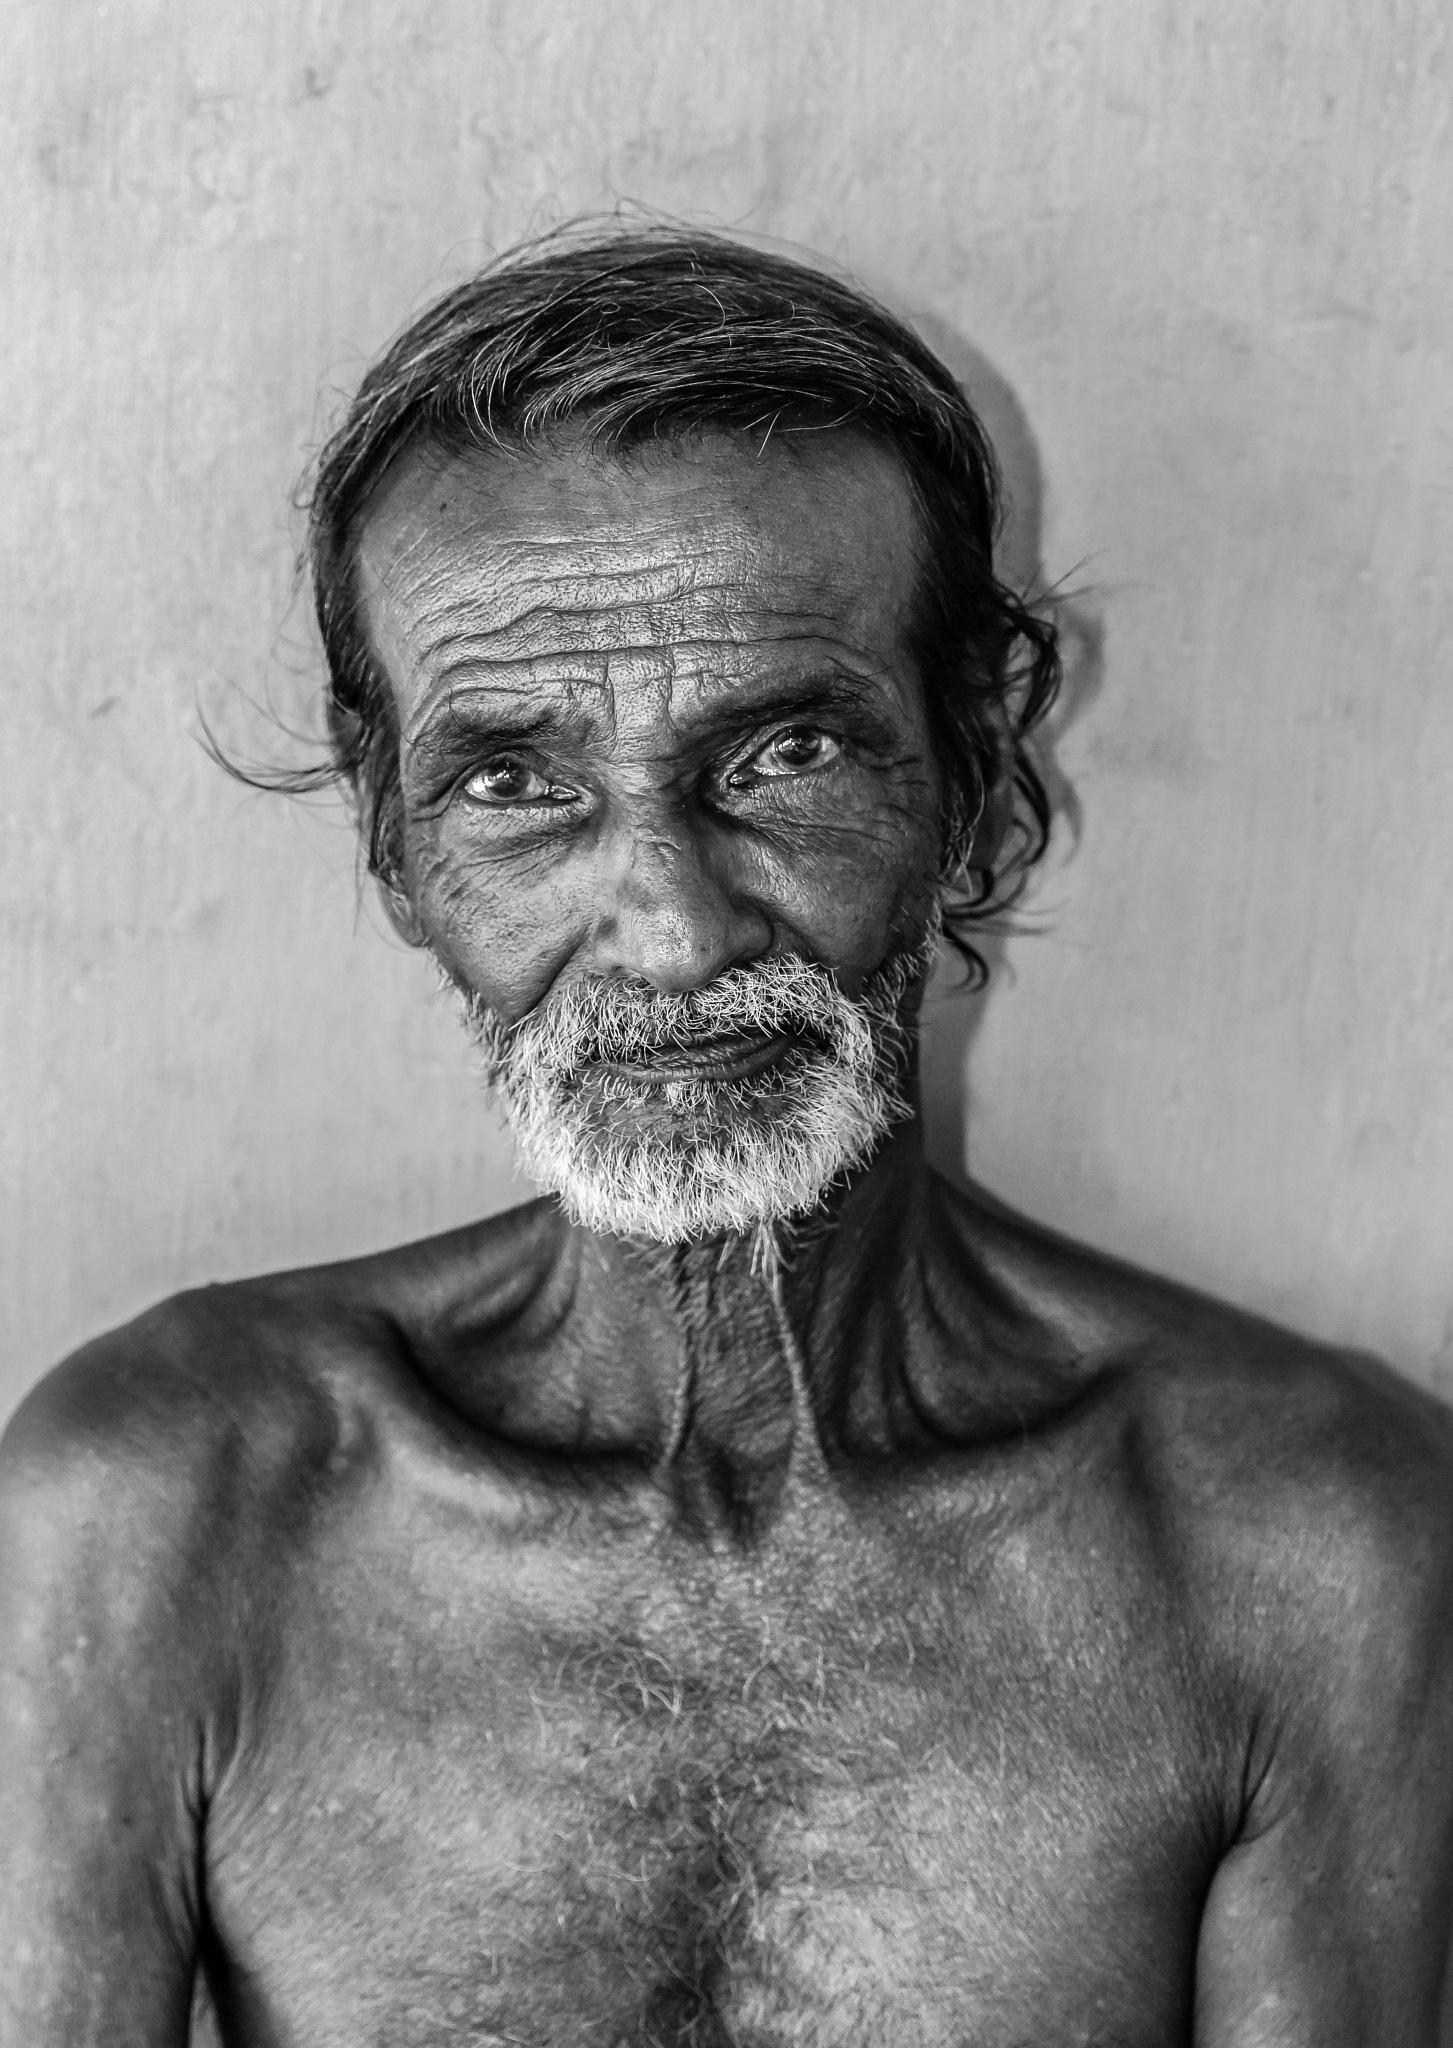 WAITING FOR HOPE  by Hesham Ali